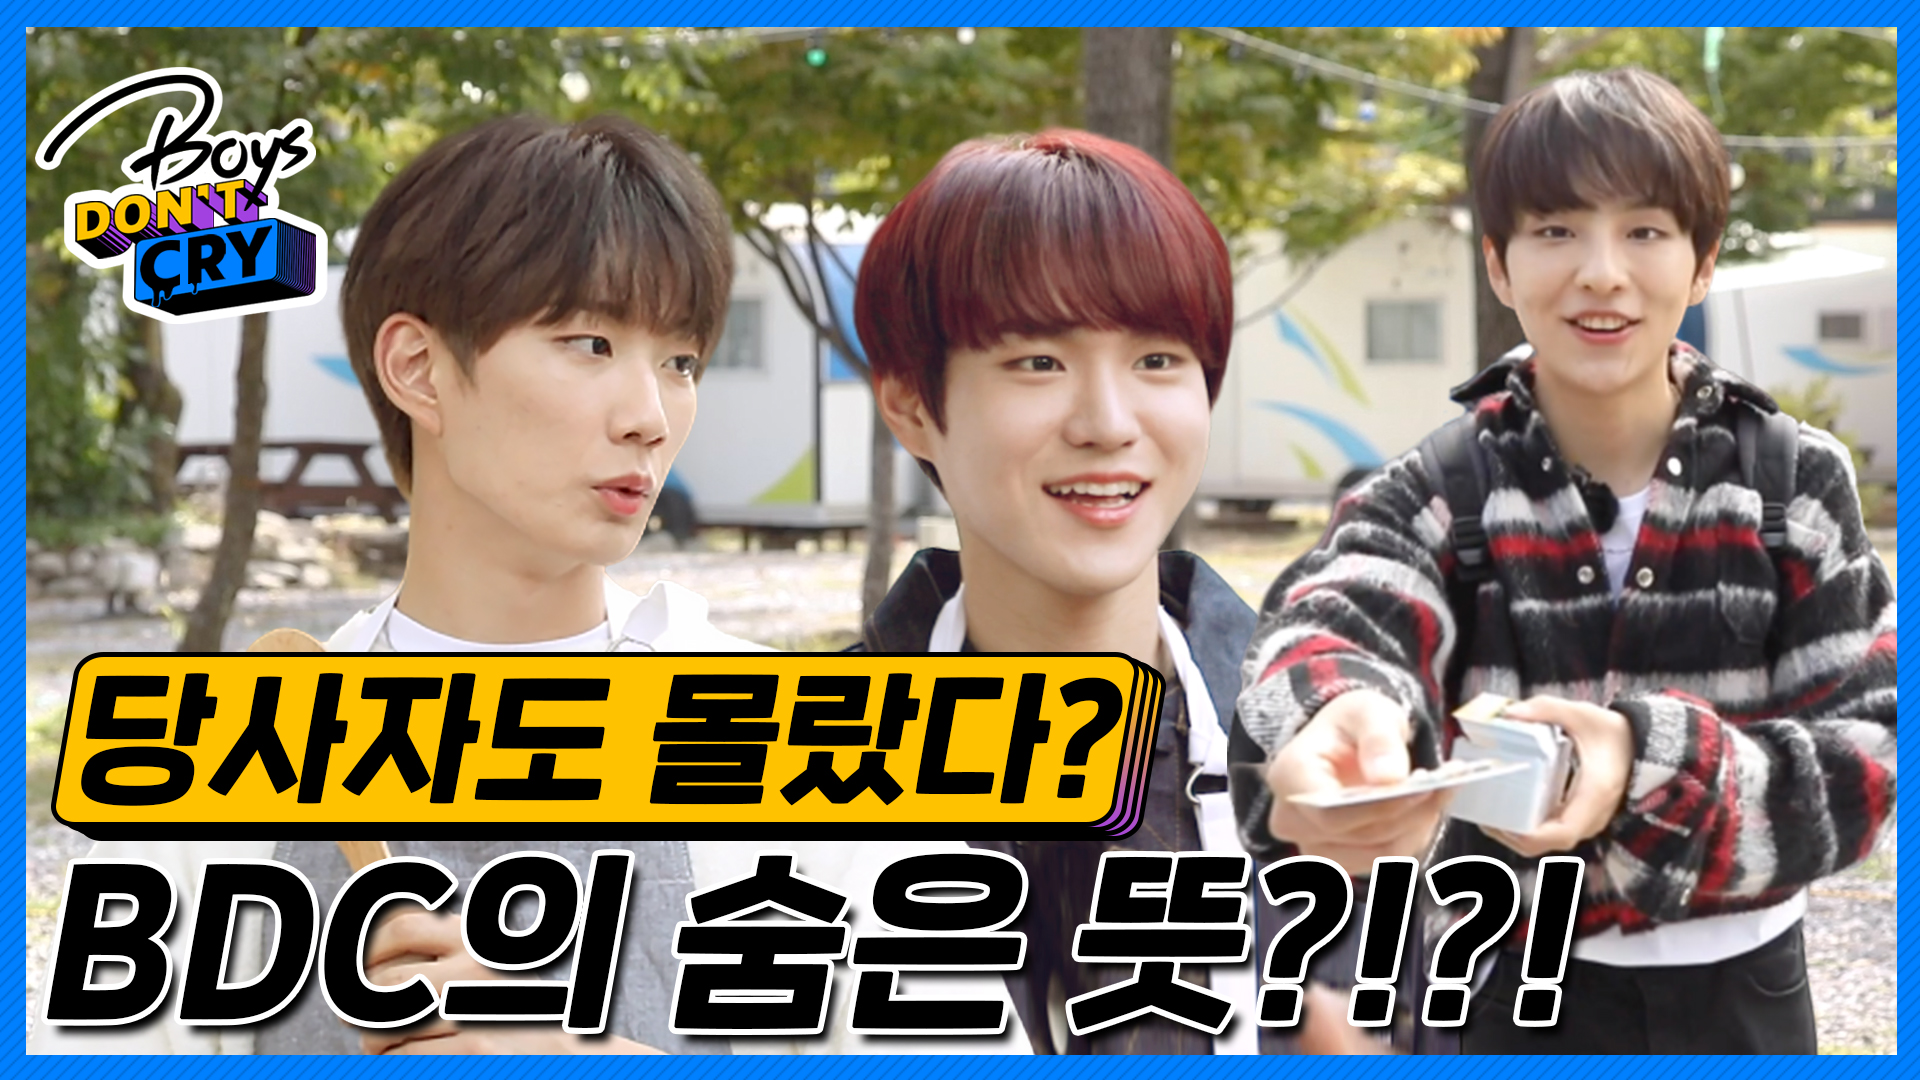 EP.04 [보이즈 돈 크라이] ⛺️첫 캠핑에 미친 텐션 보여준 BDC, 명함까지 팠다고요?